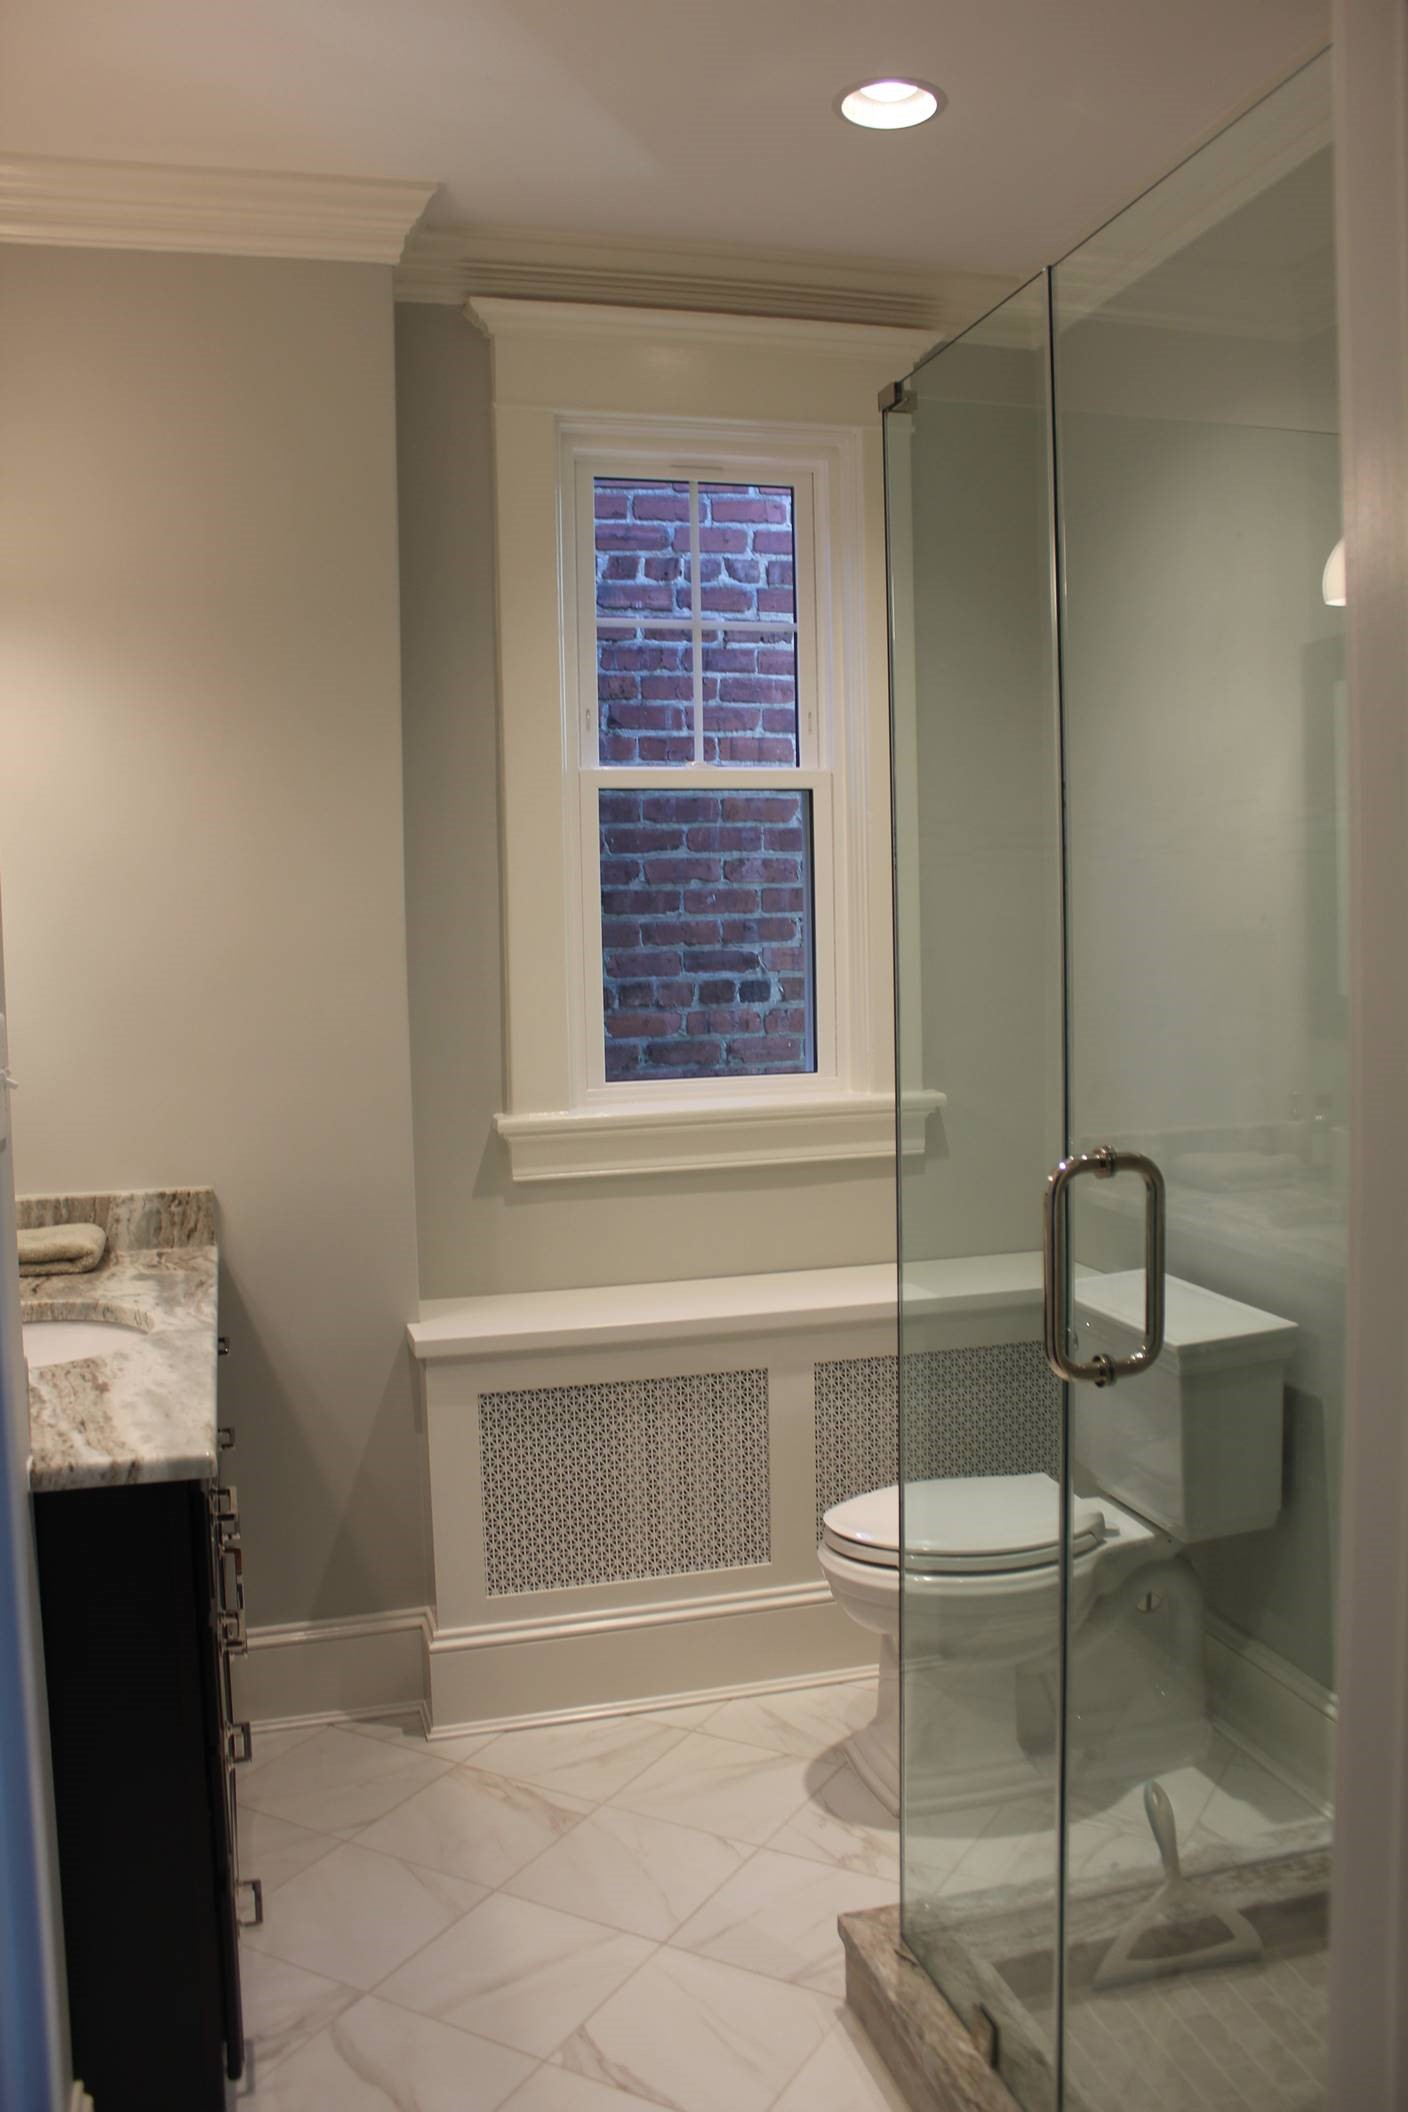 Bathroom Remodeling In Richmond Va James River Remodeling Llc